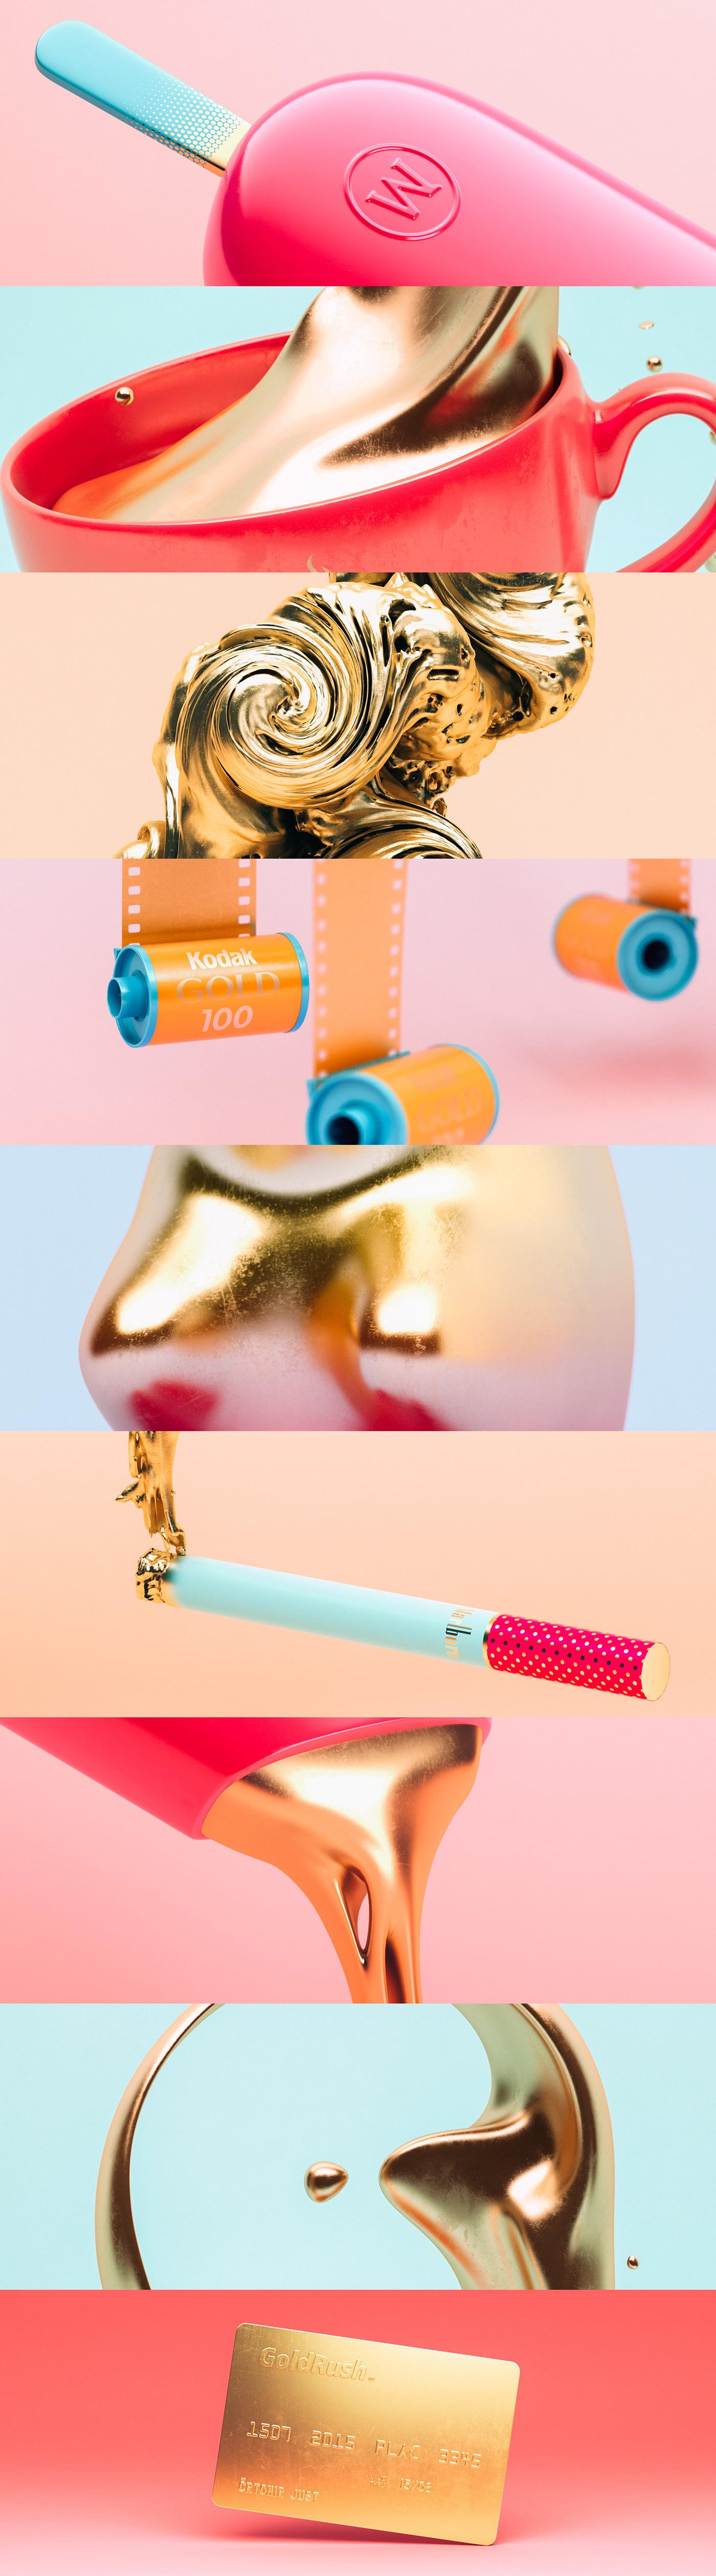 gold shiny 3D Render magnum jacobs haribo kodak marlboro